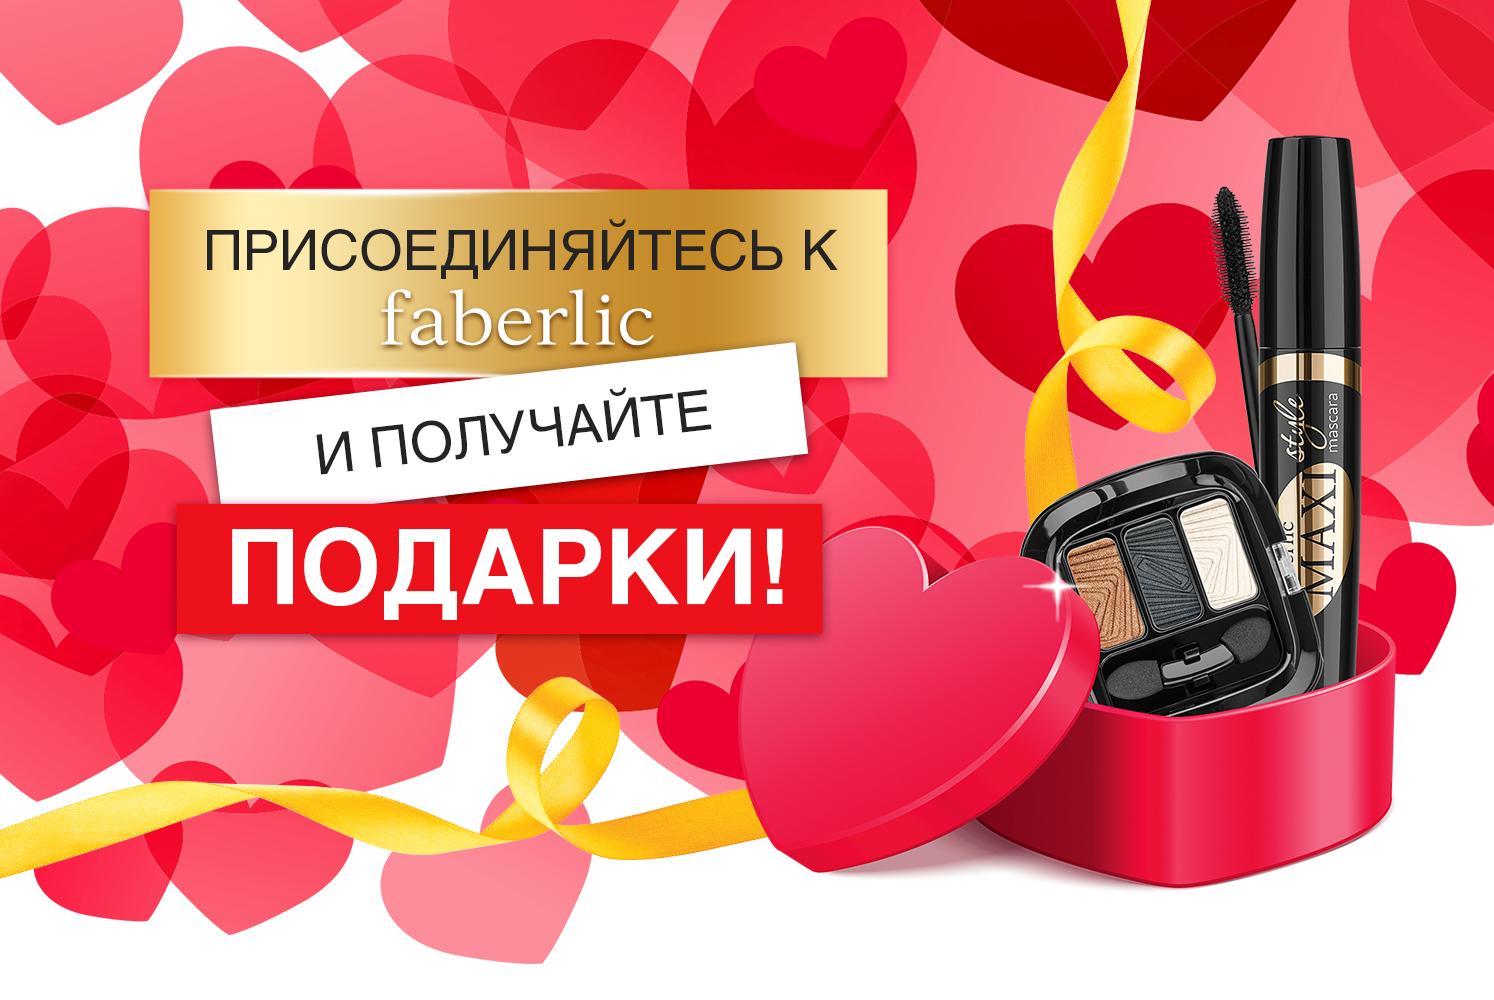 Качественная косметика Faberlic  со скидками в Беларуси